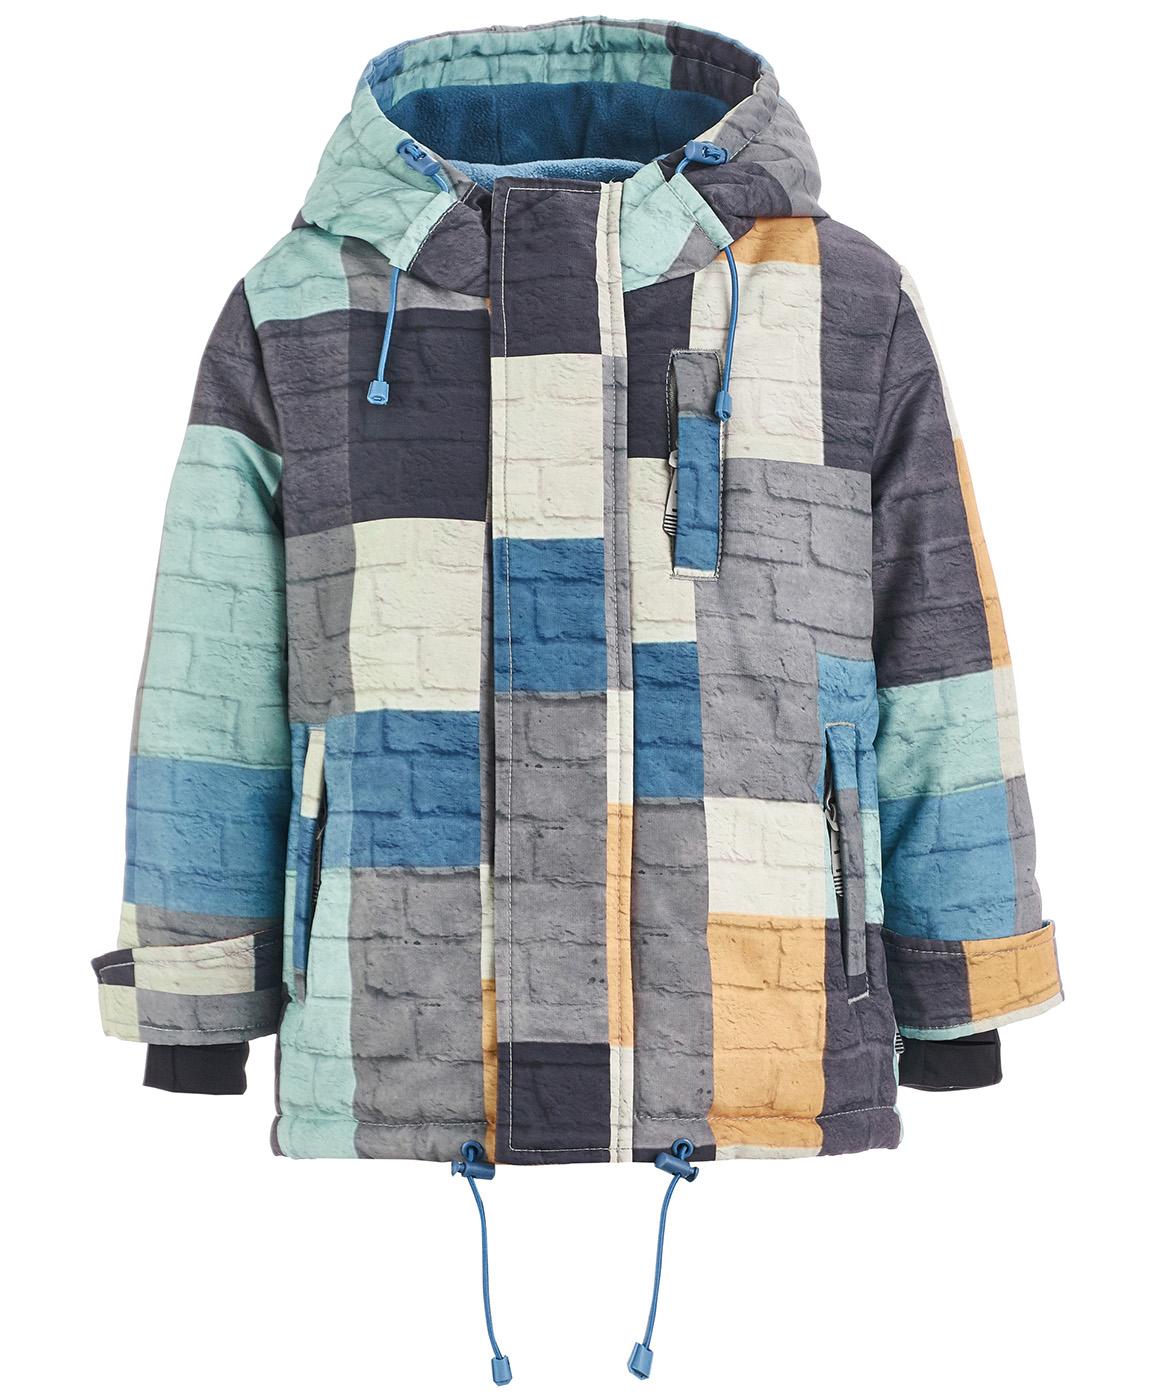 Купить 218BBBA41010122, Куртка Button Blue, BUTTON BLUE Active, серый, 128, Мужской, ОСЕНЬ/ЗИМА 2018-2019 (shop: GulliverMarket Gulliver Market)